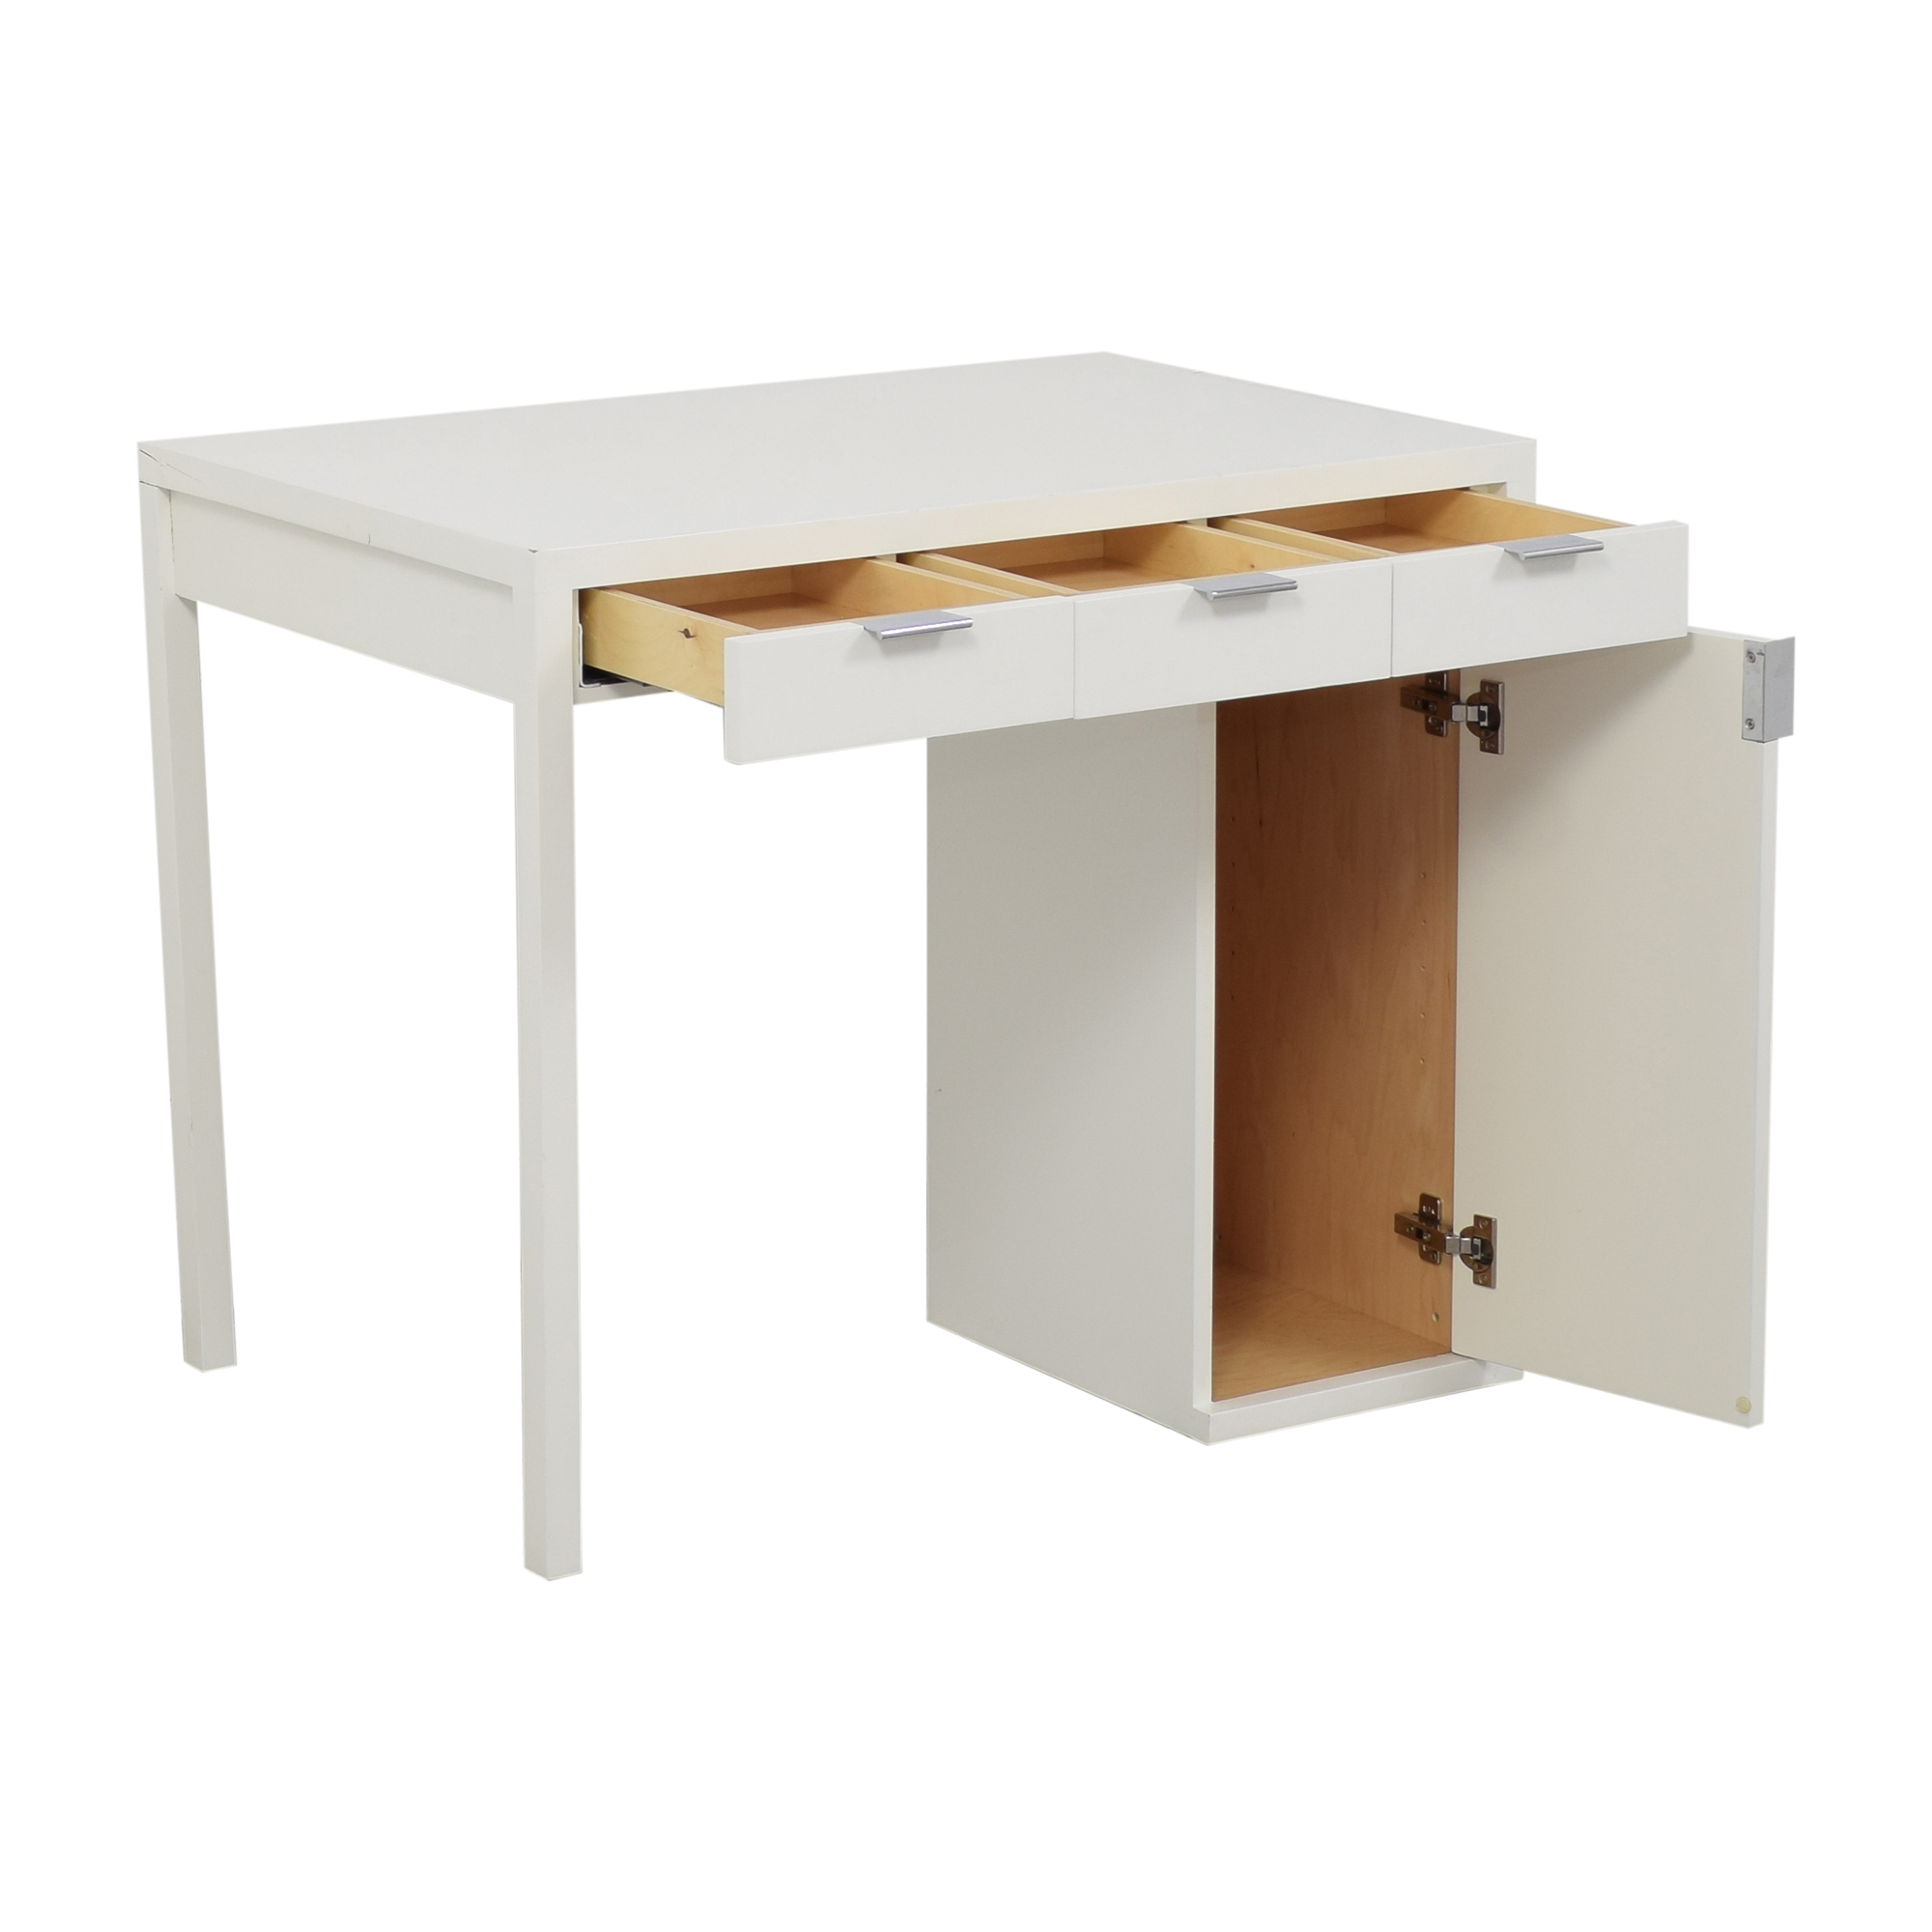 Custom Desk with Storage / Home Office Desks